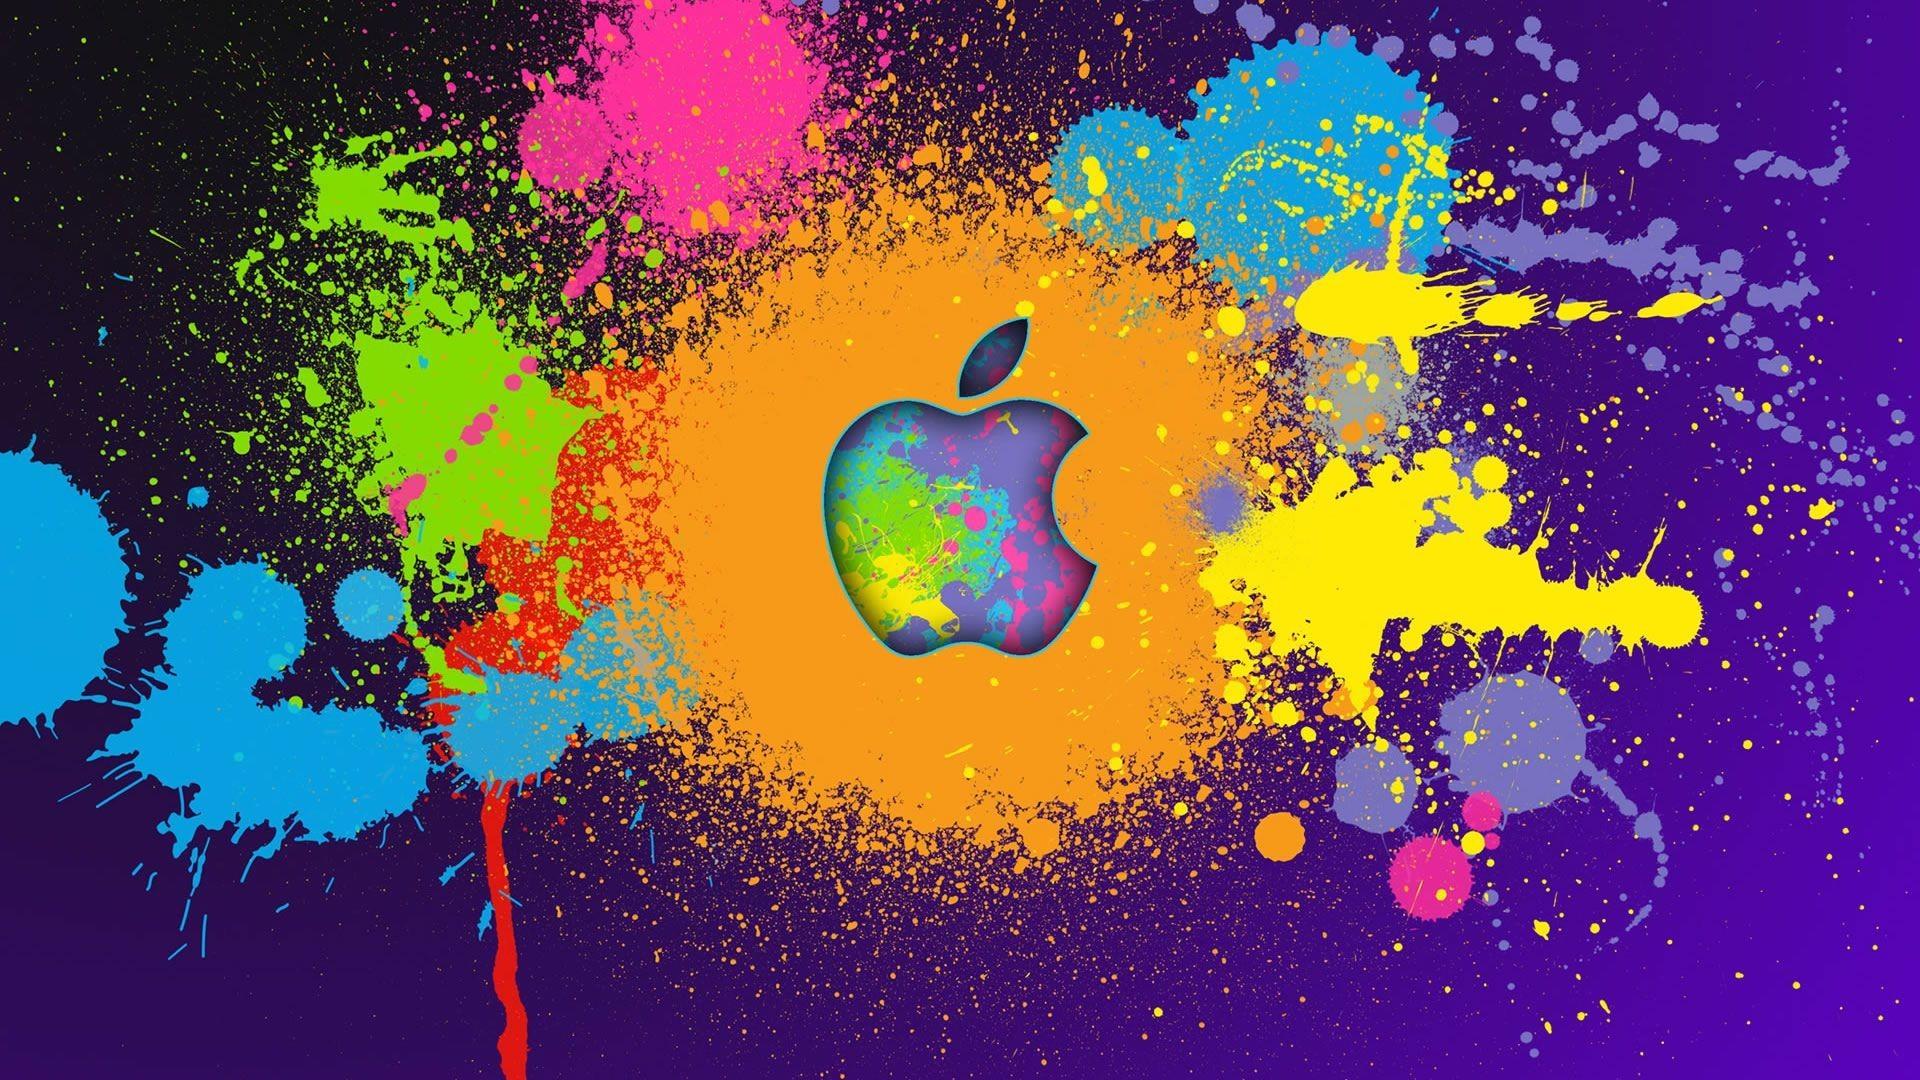 undefined Apple Wallpapers Desktop (33 Wallpapers) | Adorable Wallpapers